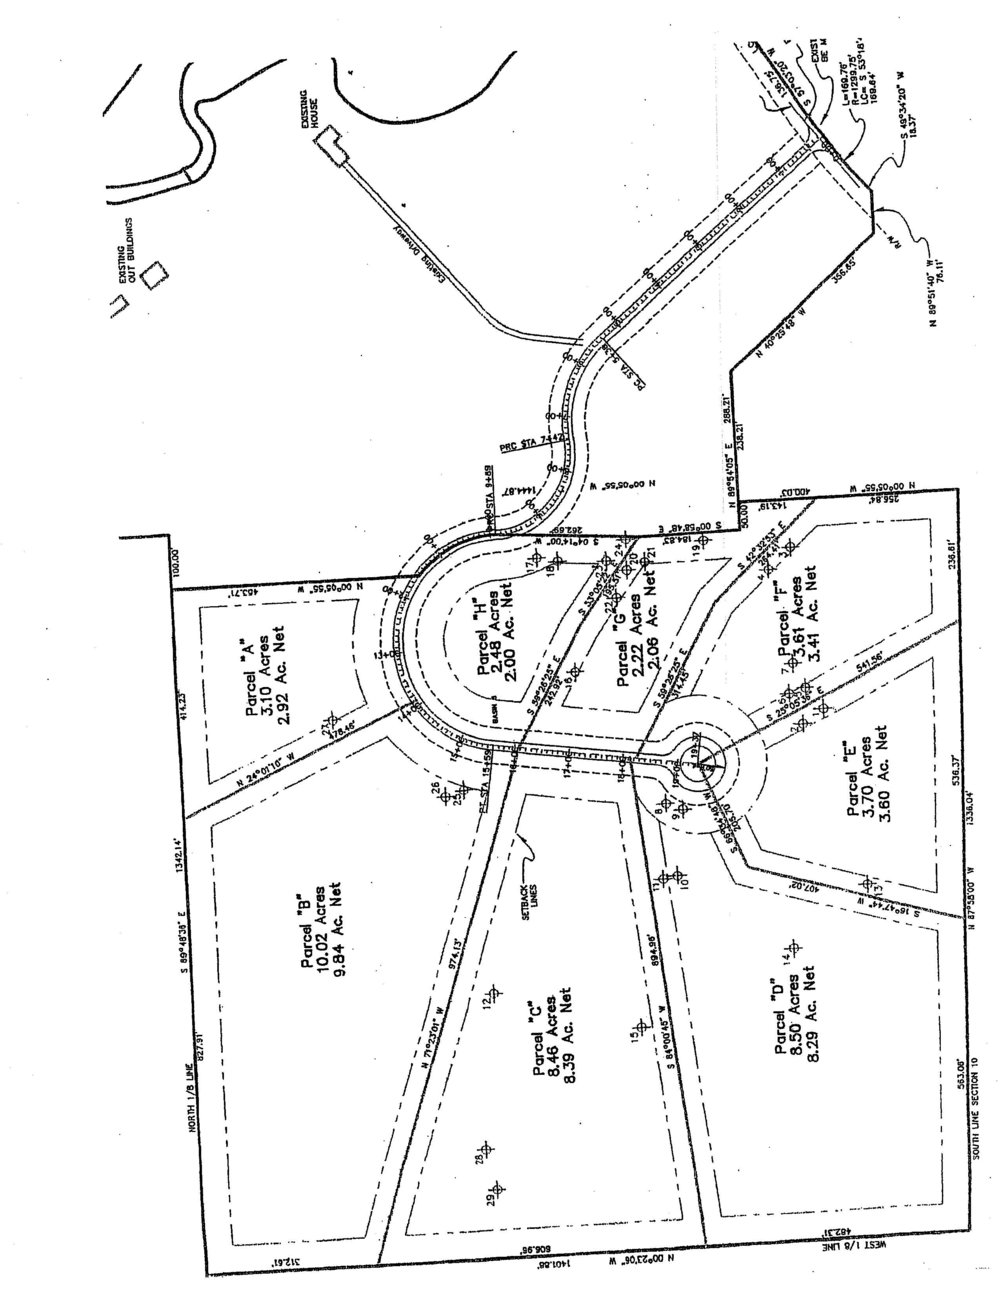 11635 E Belanger Woods Dr Marketing Packet - For Sale by Oltersdorf Realty LLC (10).jpg